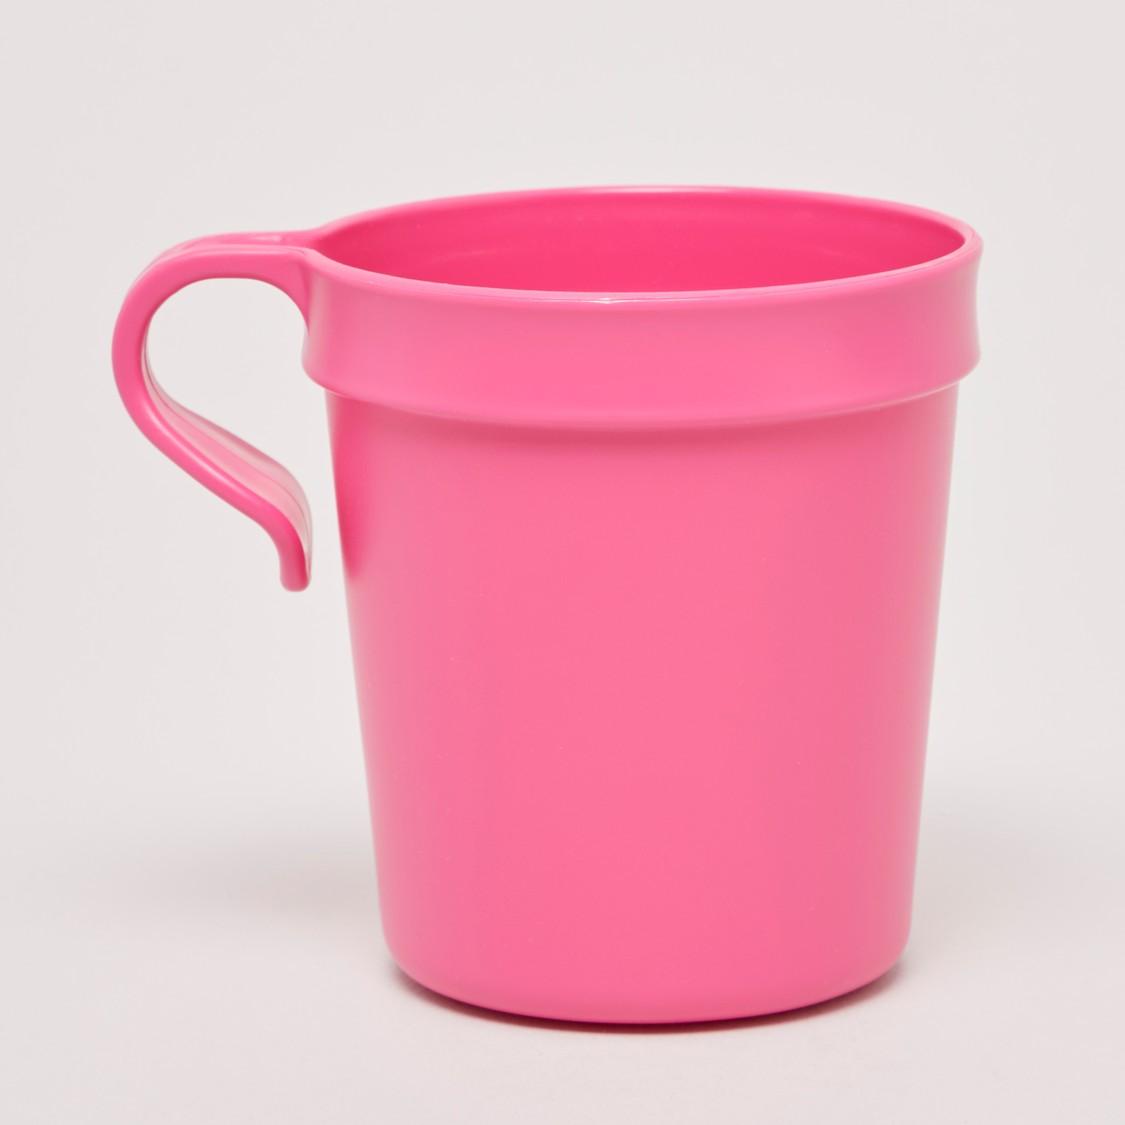 Set of 6 - Solid Mug with Handle - 10x8x29 cms